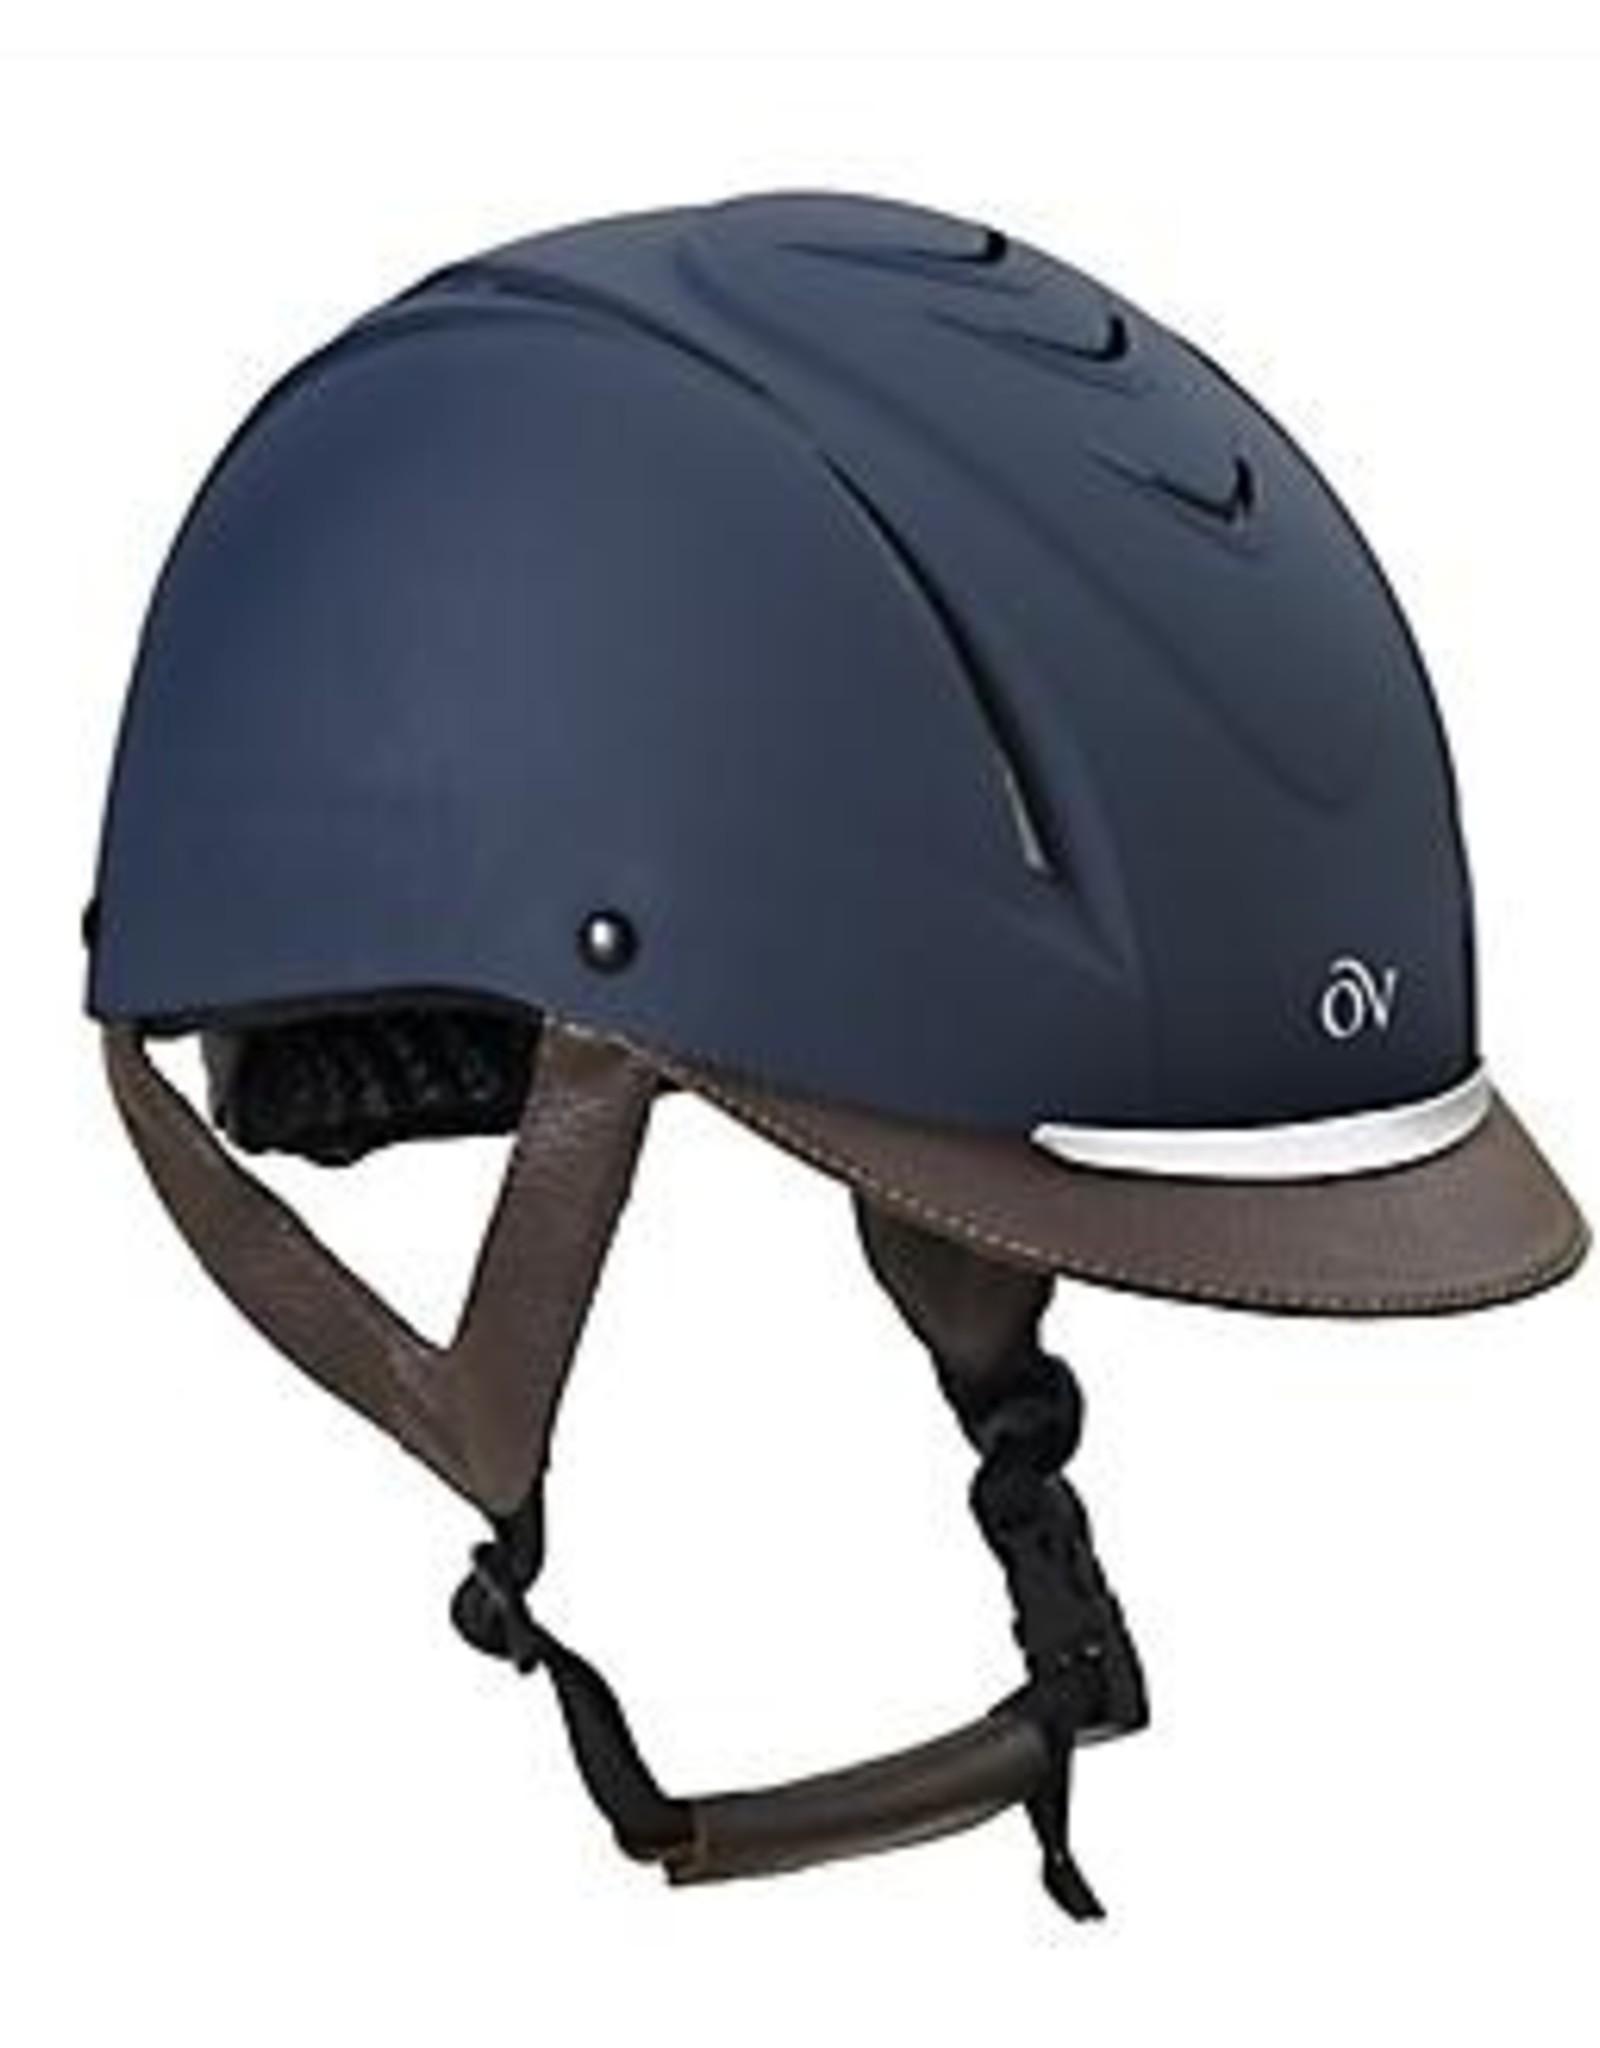 Ovation Z6 Elite Helmet